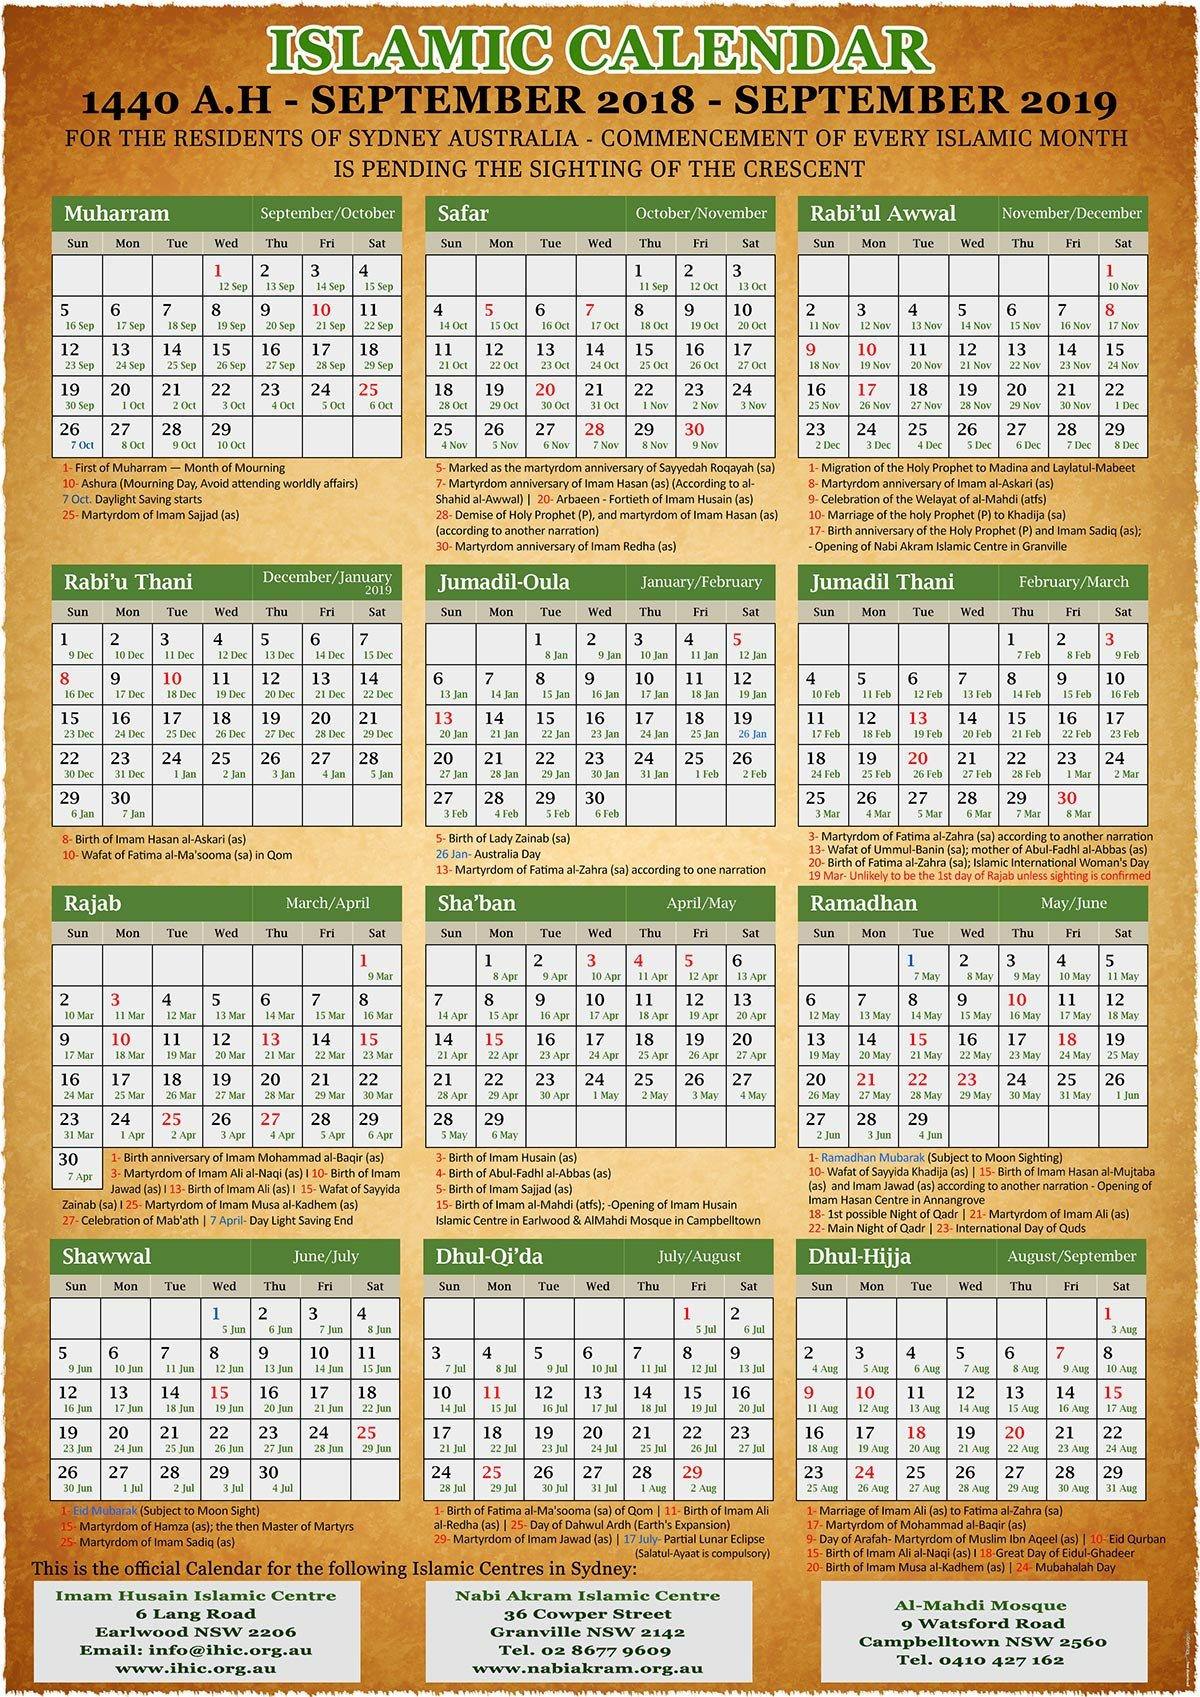 Annual Islamic Calendar 1440 A.h. (2019) – Imam Husain Islamic Centre Calendar 2019 Hijri